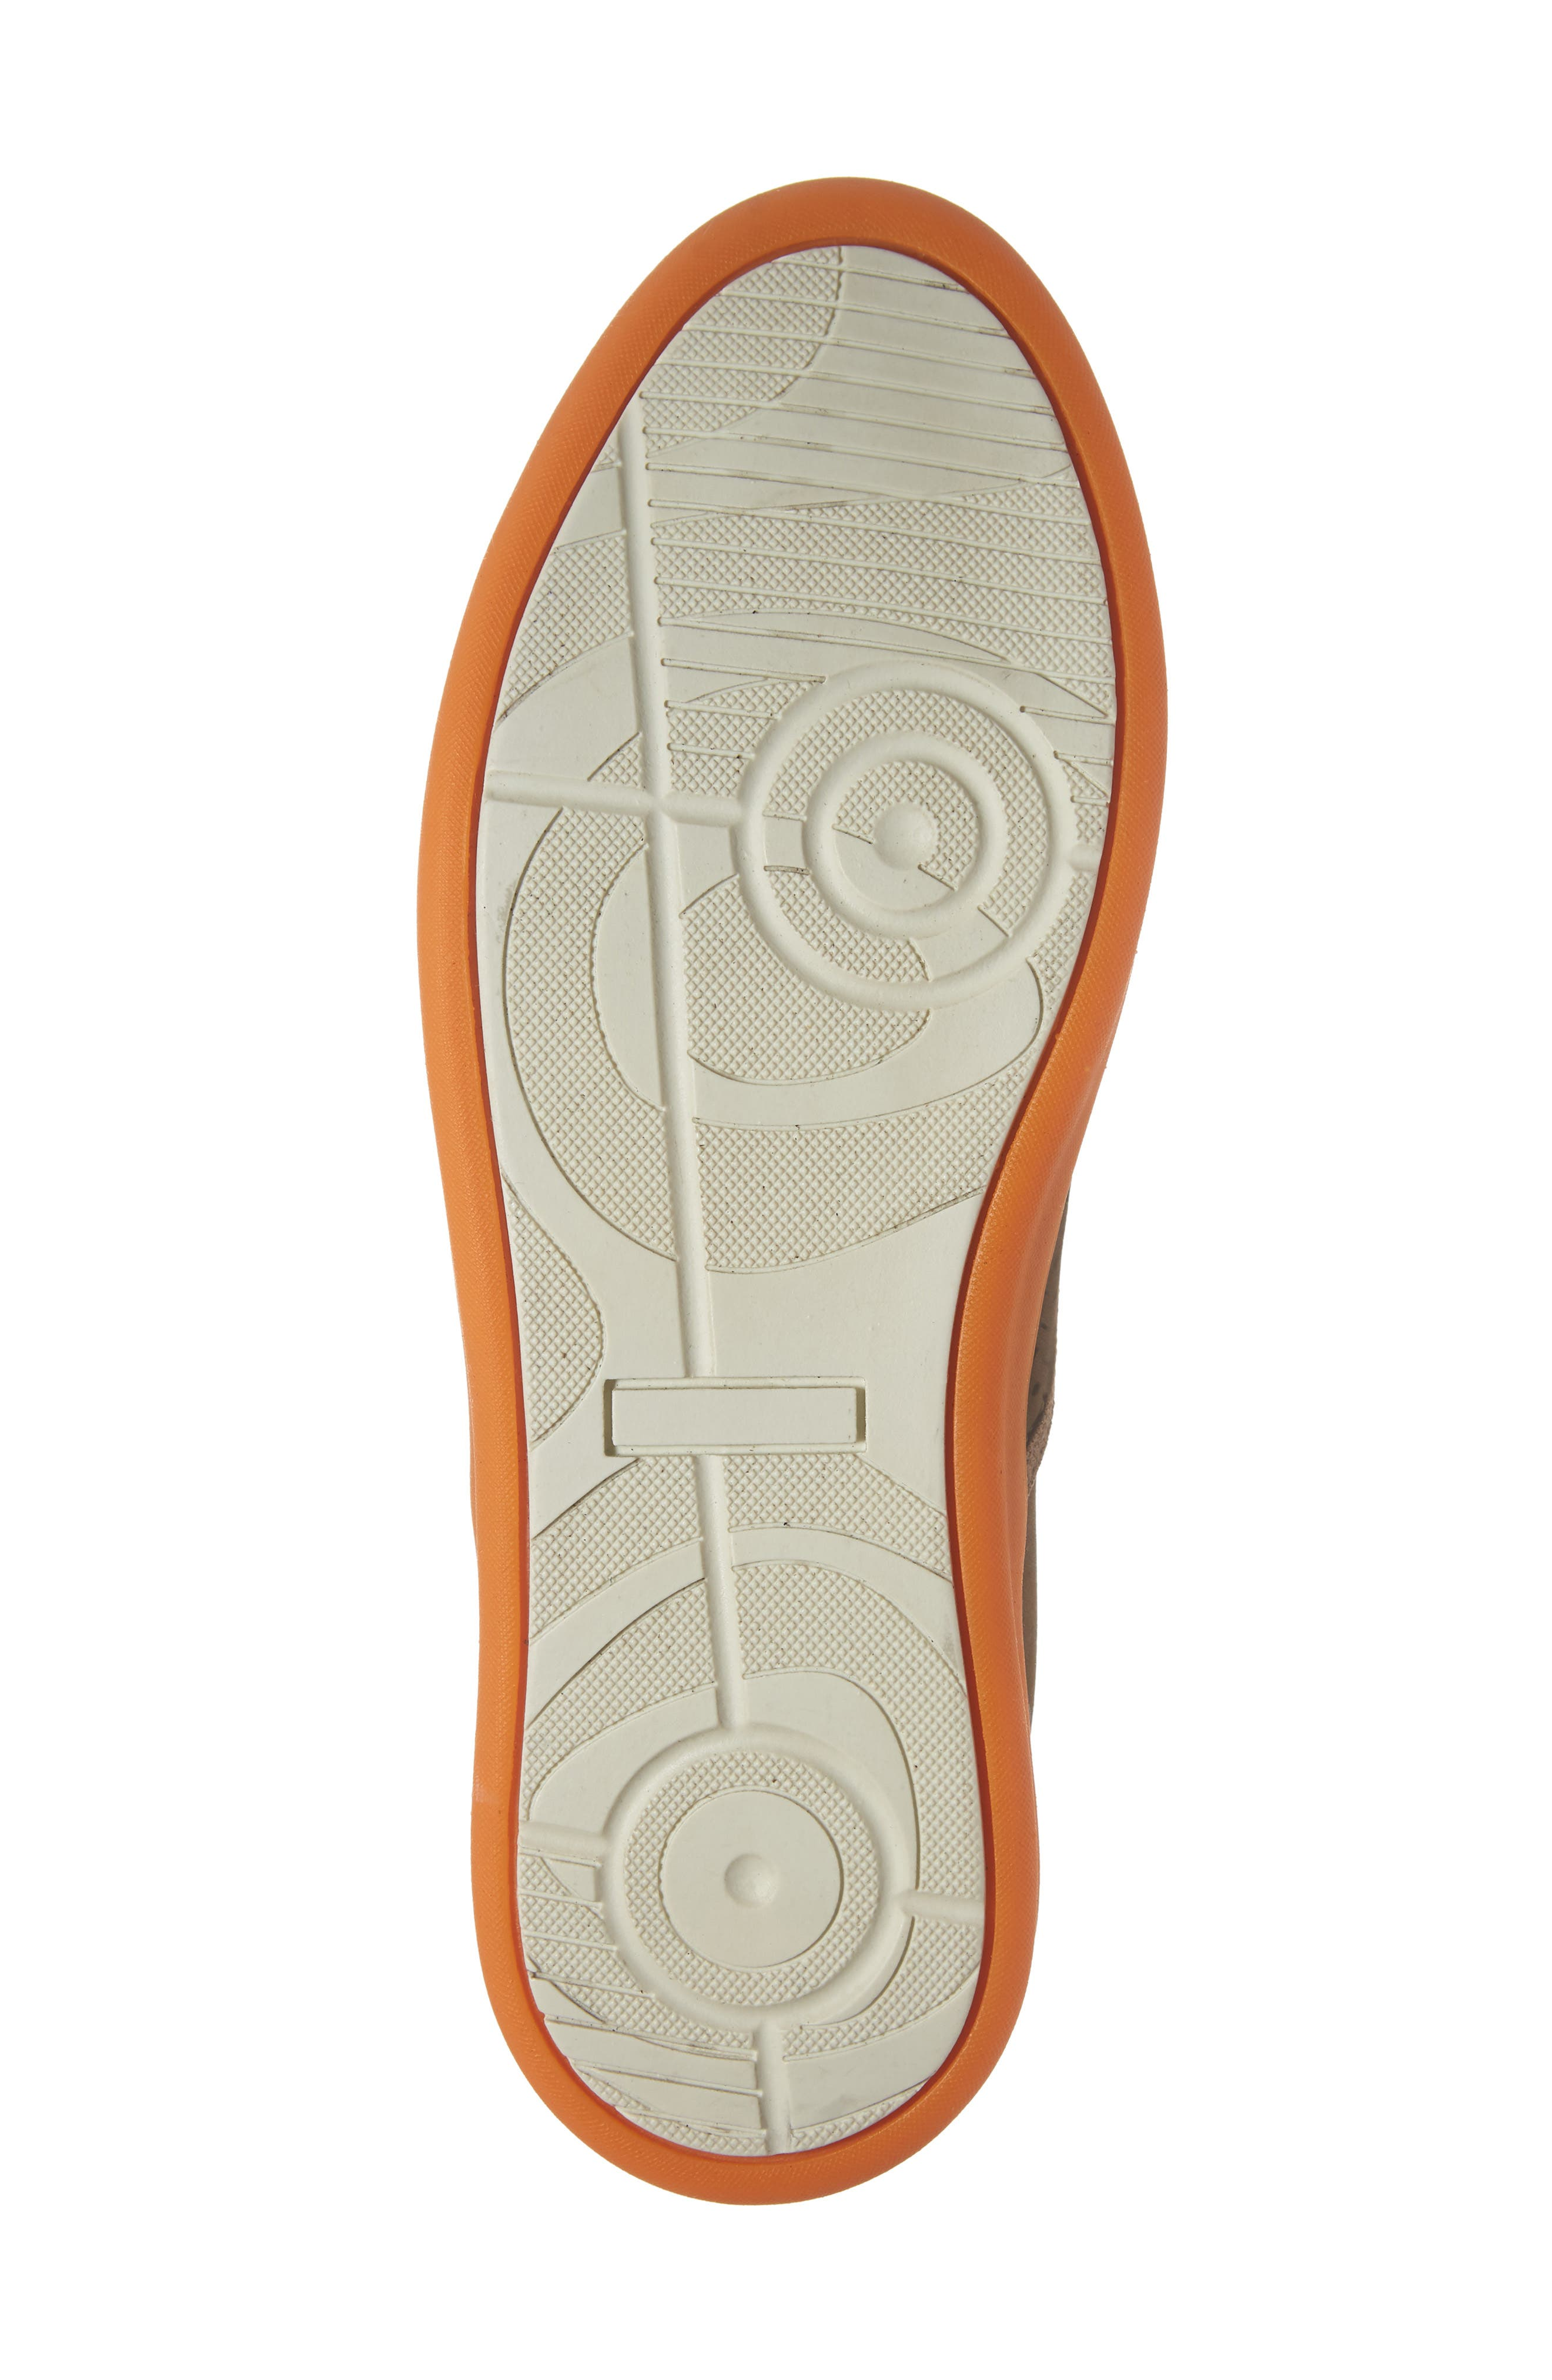 Malibu Perforated Loafer,                             Alternate thumbnail 6, color,                             SAND NUBUCK